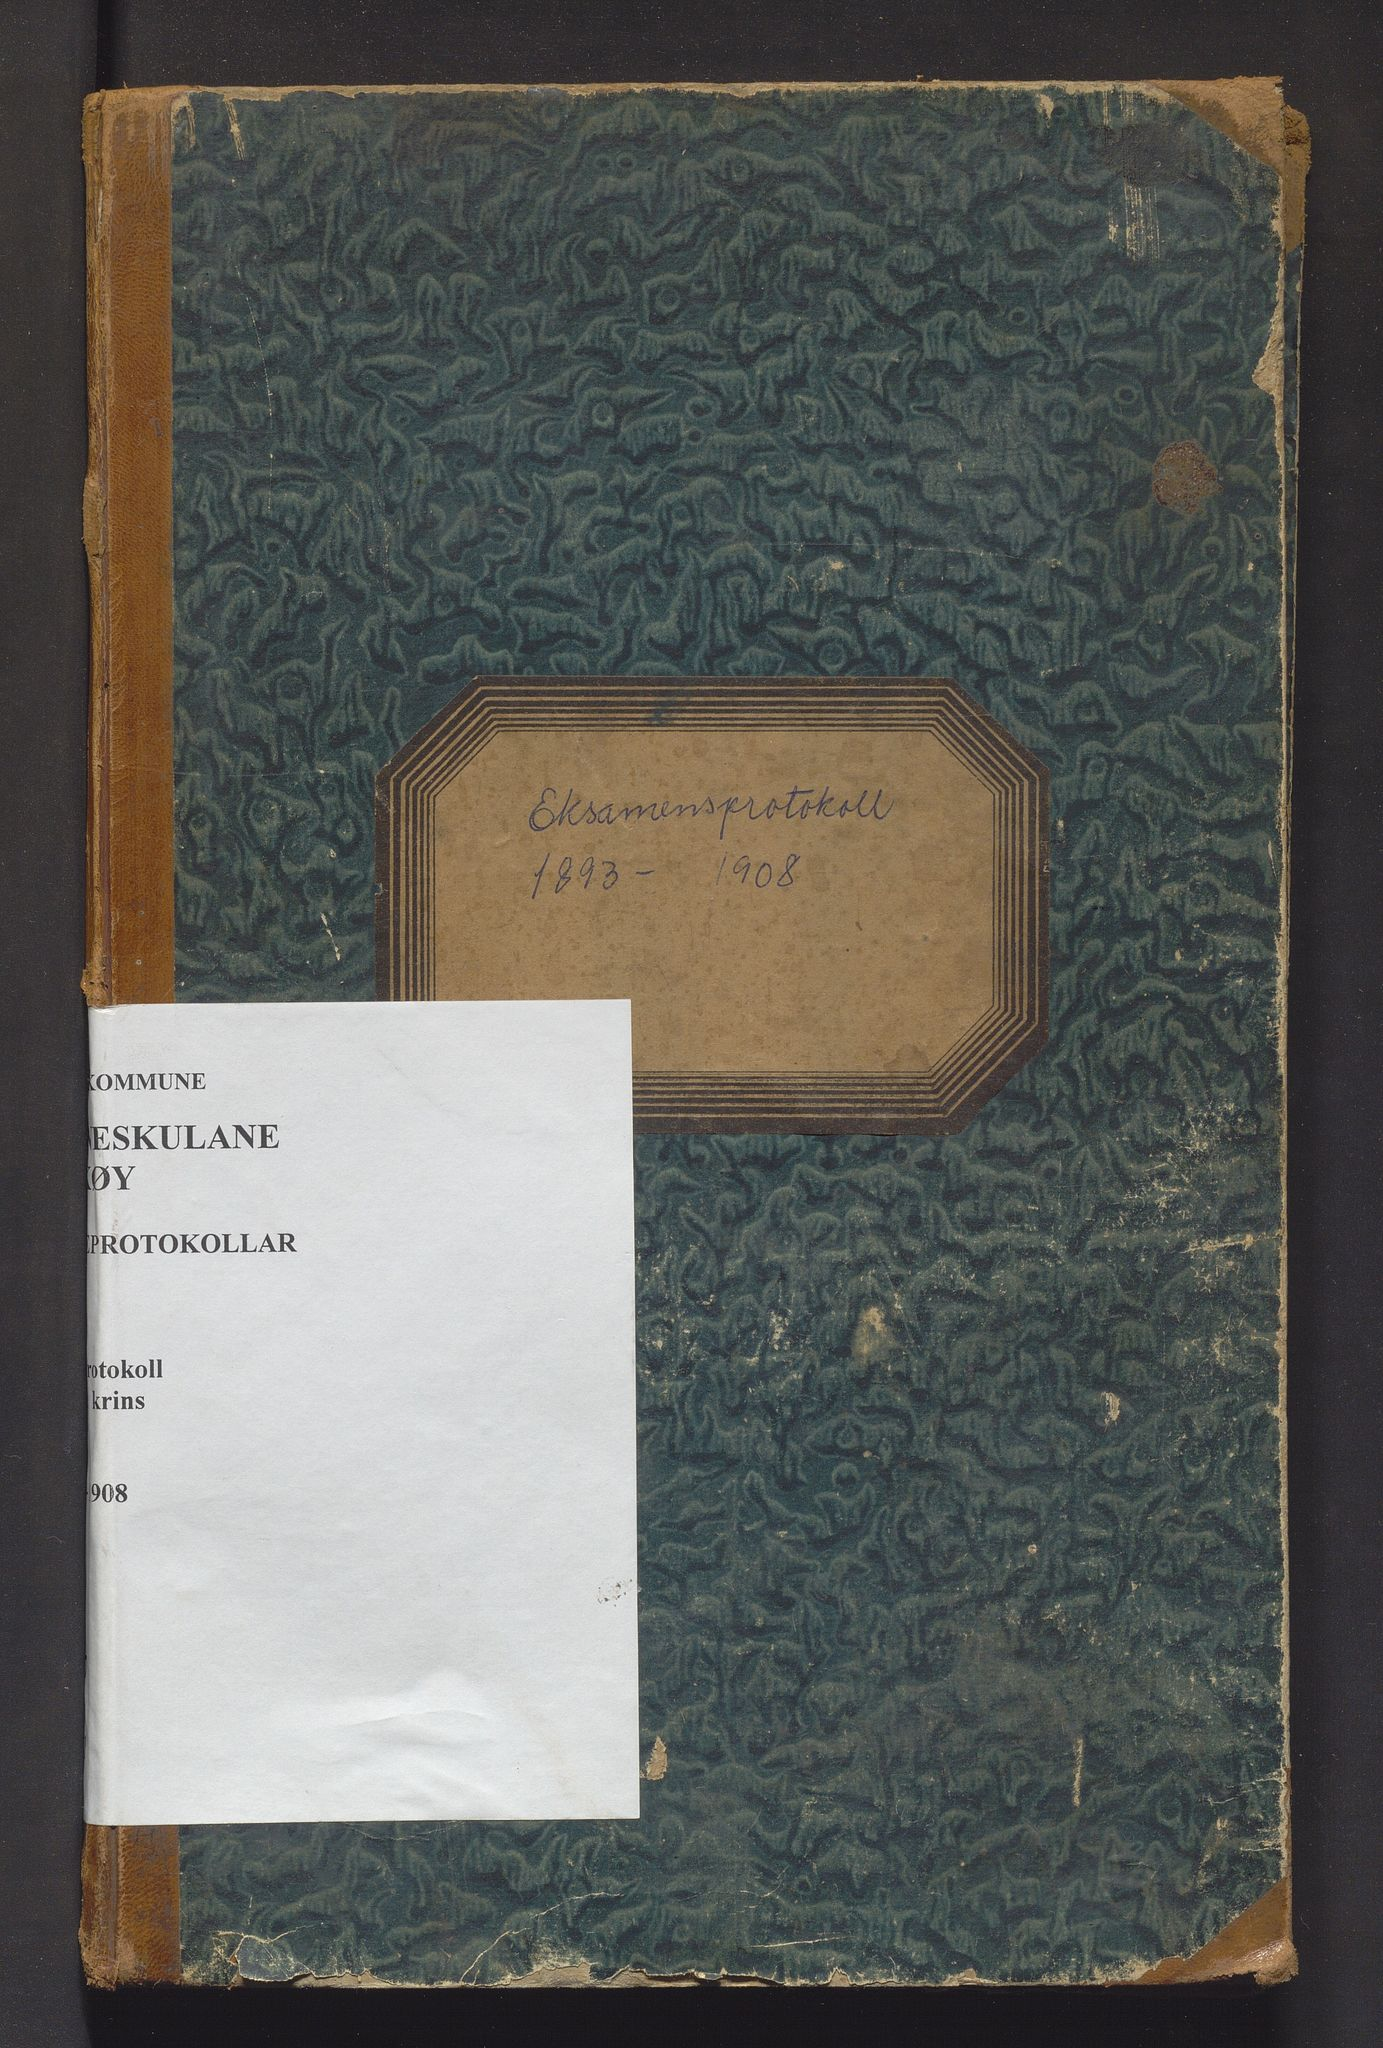 IKAH, Askøy kommune. Barneskulane, F/Fd/L0001: Skuleprotokoll for Follese og Haugland krinsar , 1893-1908